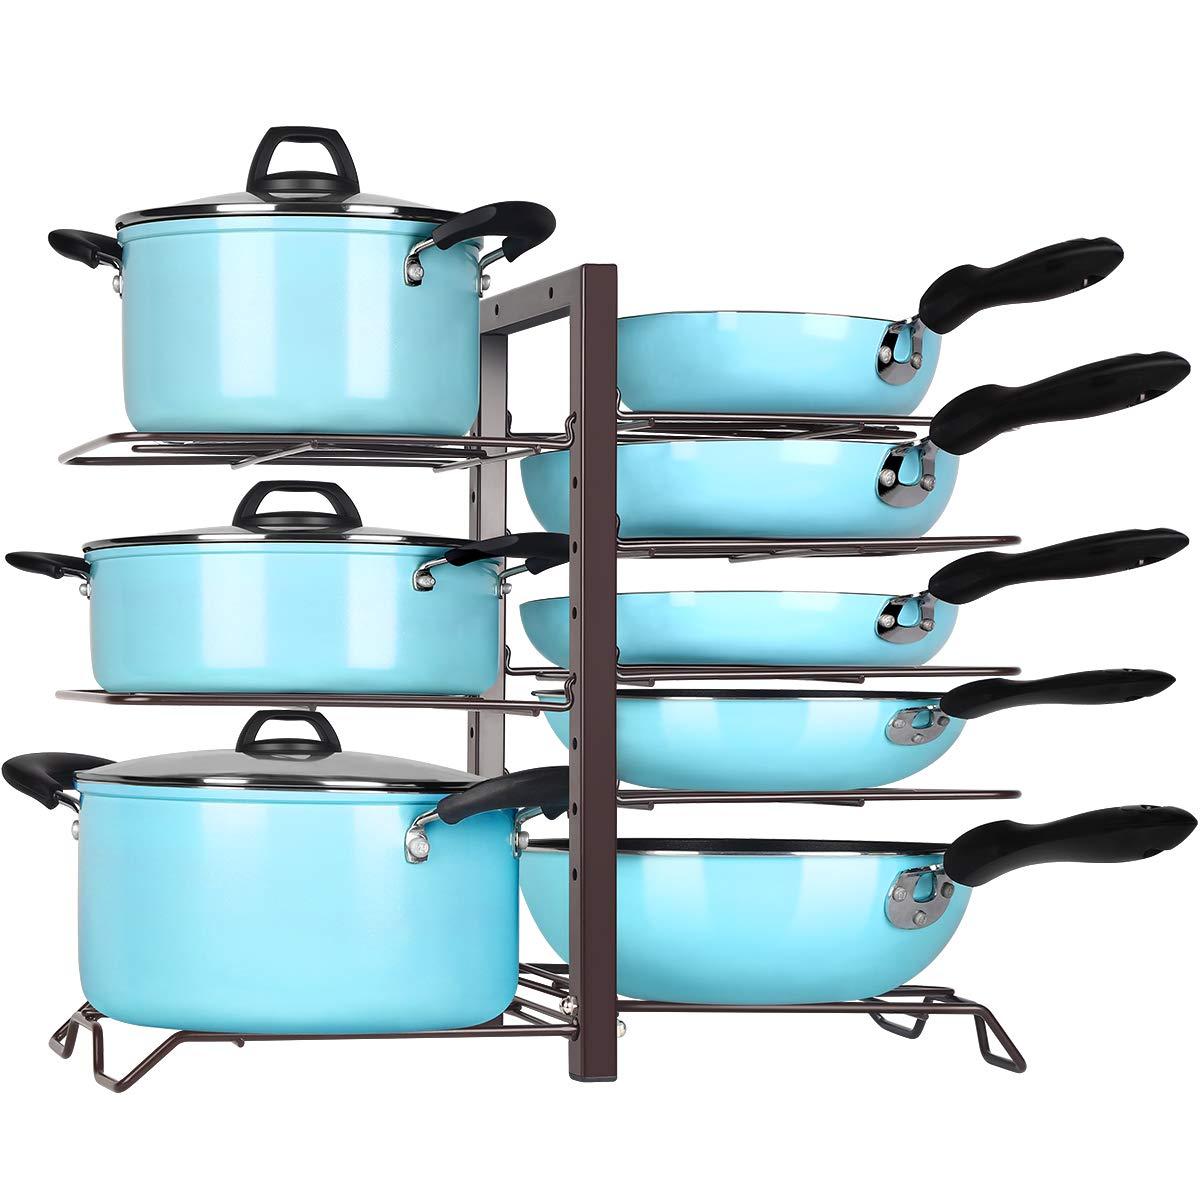 TomCare Pan Organizer Pot Rack Organizer Kitchen Cabinet Organizer Adjustable Height Pots and Pans Organizer Storage with 8 Metal Shelves DIY Pot Holder Lid Organizer Kitchen Cabinet Pantry, Bronze